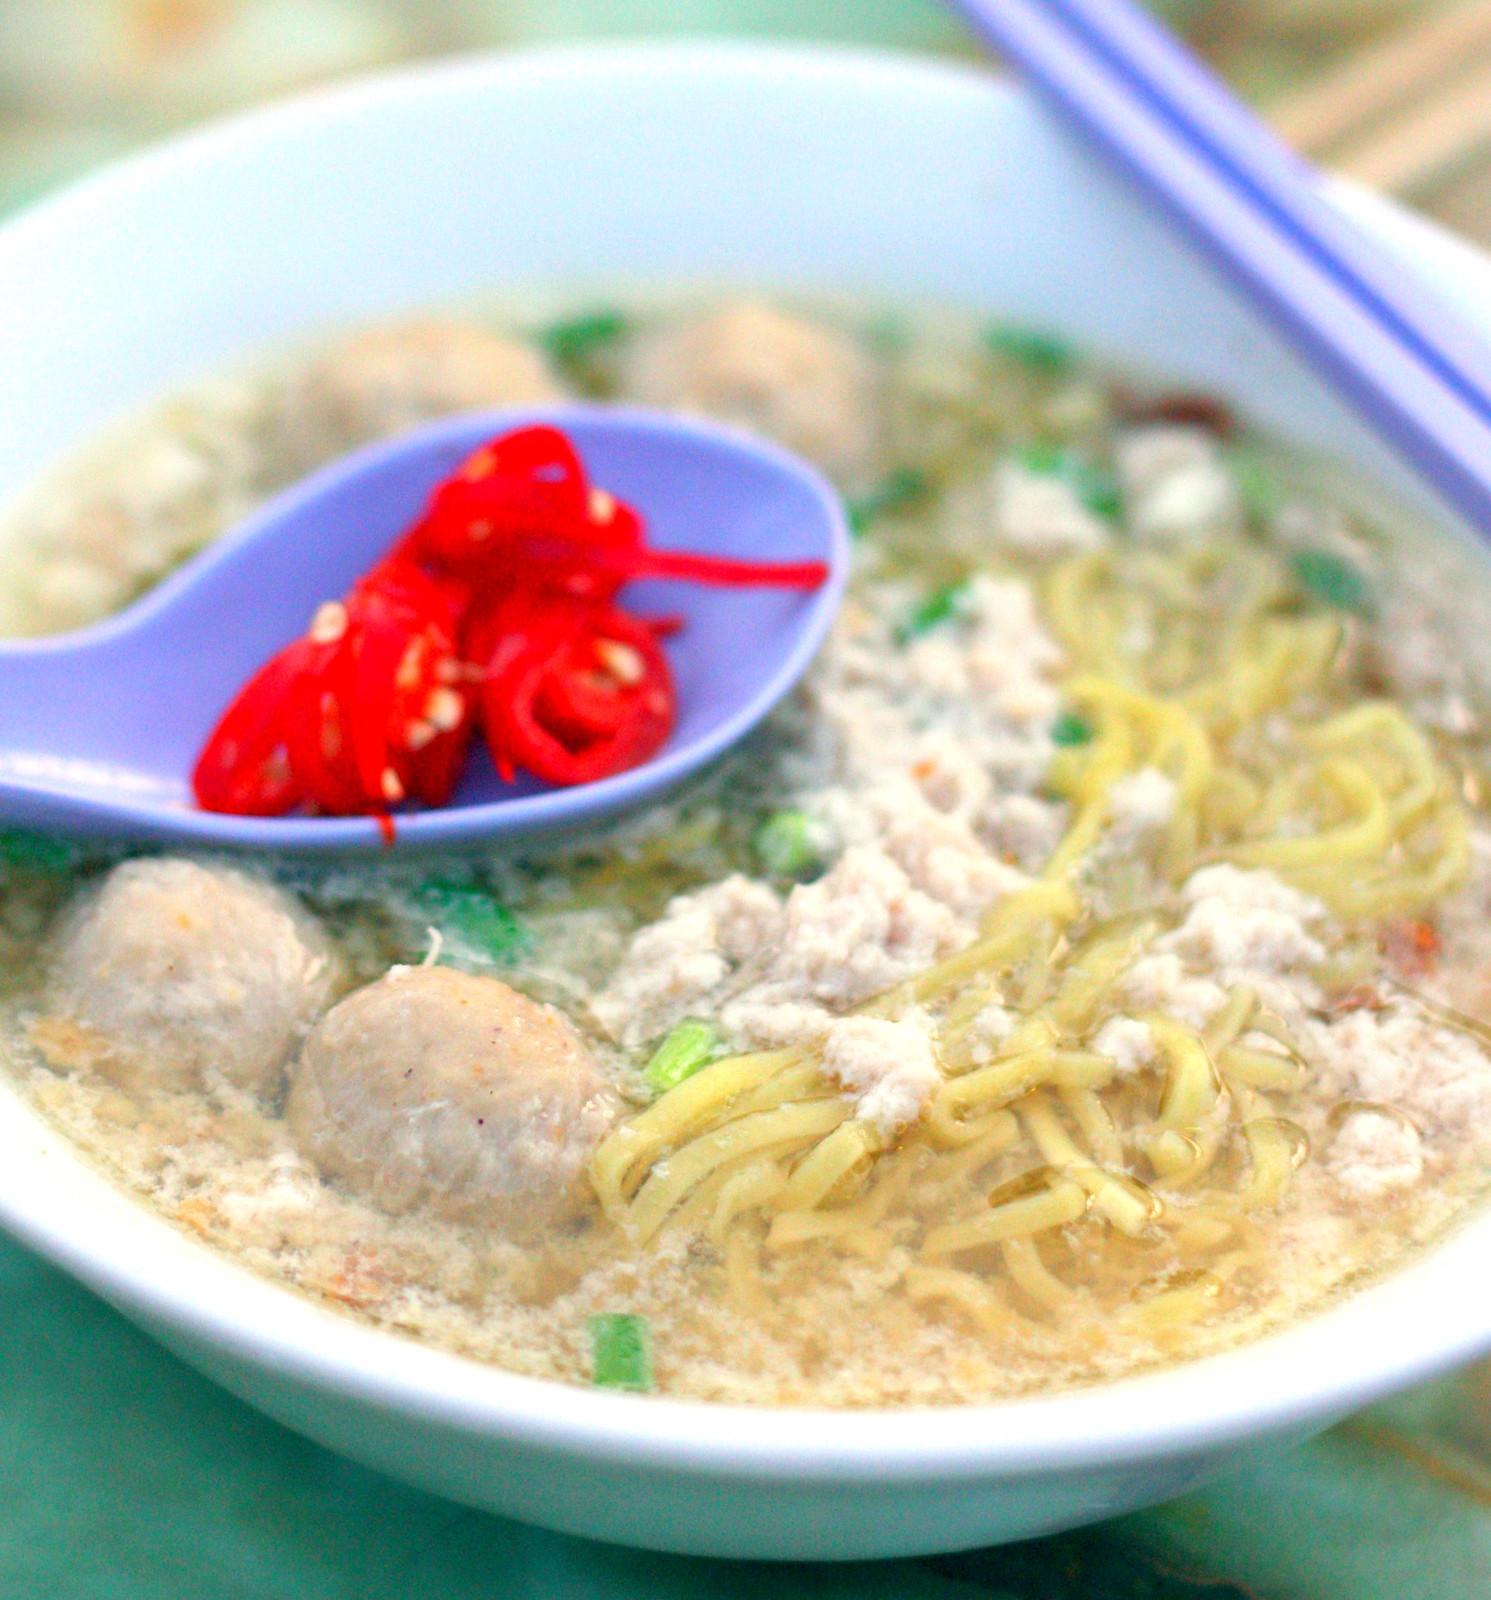 Bedok Food: Seng Hiang Bak Chor Mee